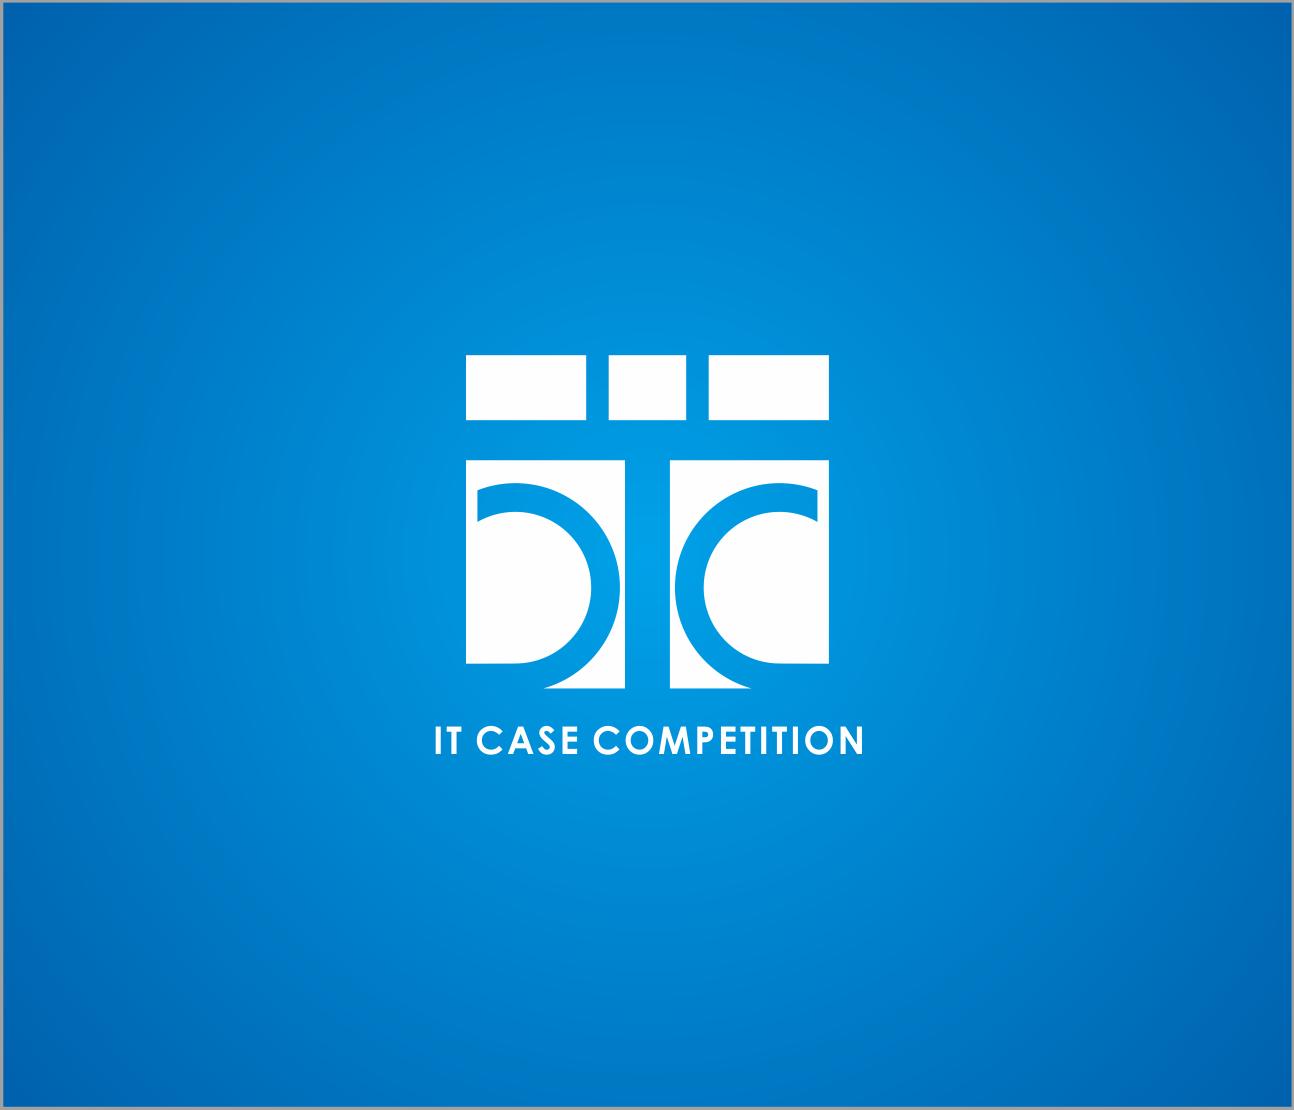 Logo Design by Armada Jamaluddin - Entry No. 37 in the Logo Design Contest Inspiring Logo Design for ITCC.